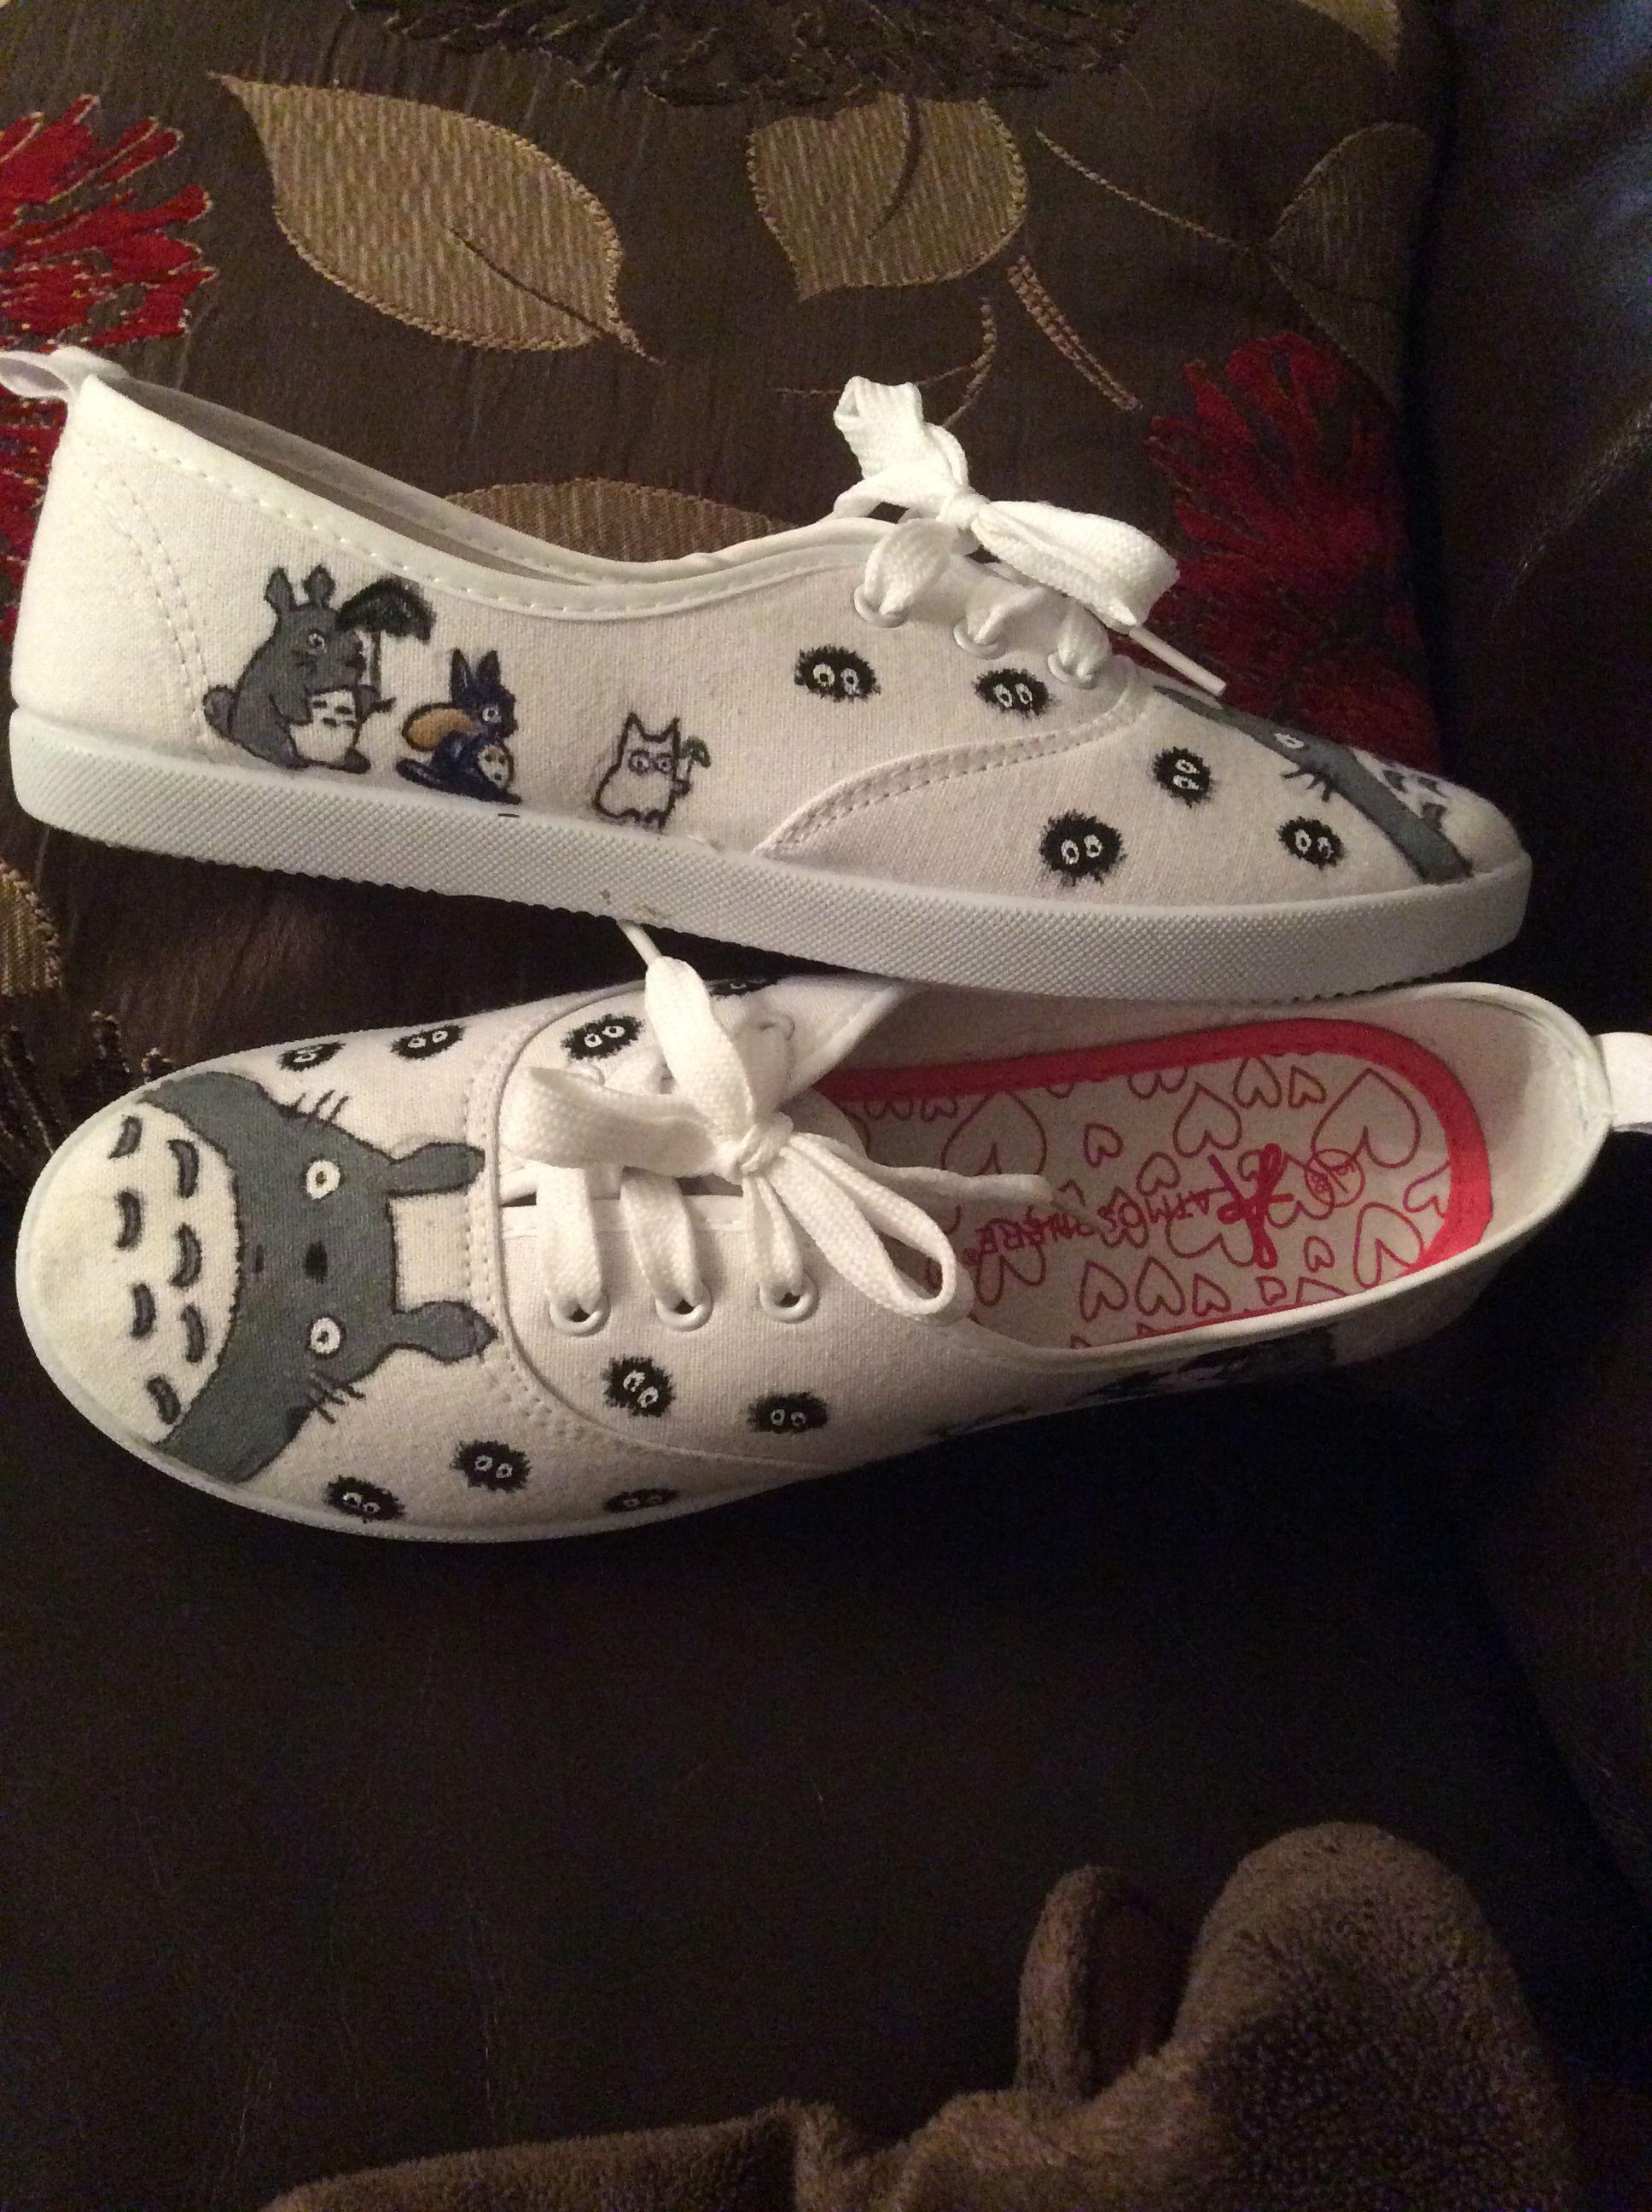 Studio Ghibli handbemalte Schuhe Serie Totoro von